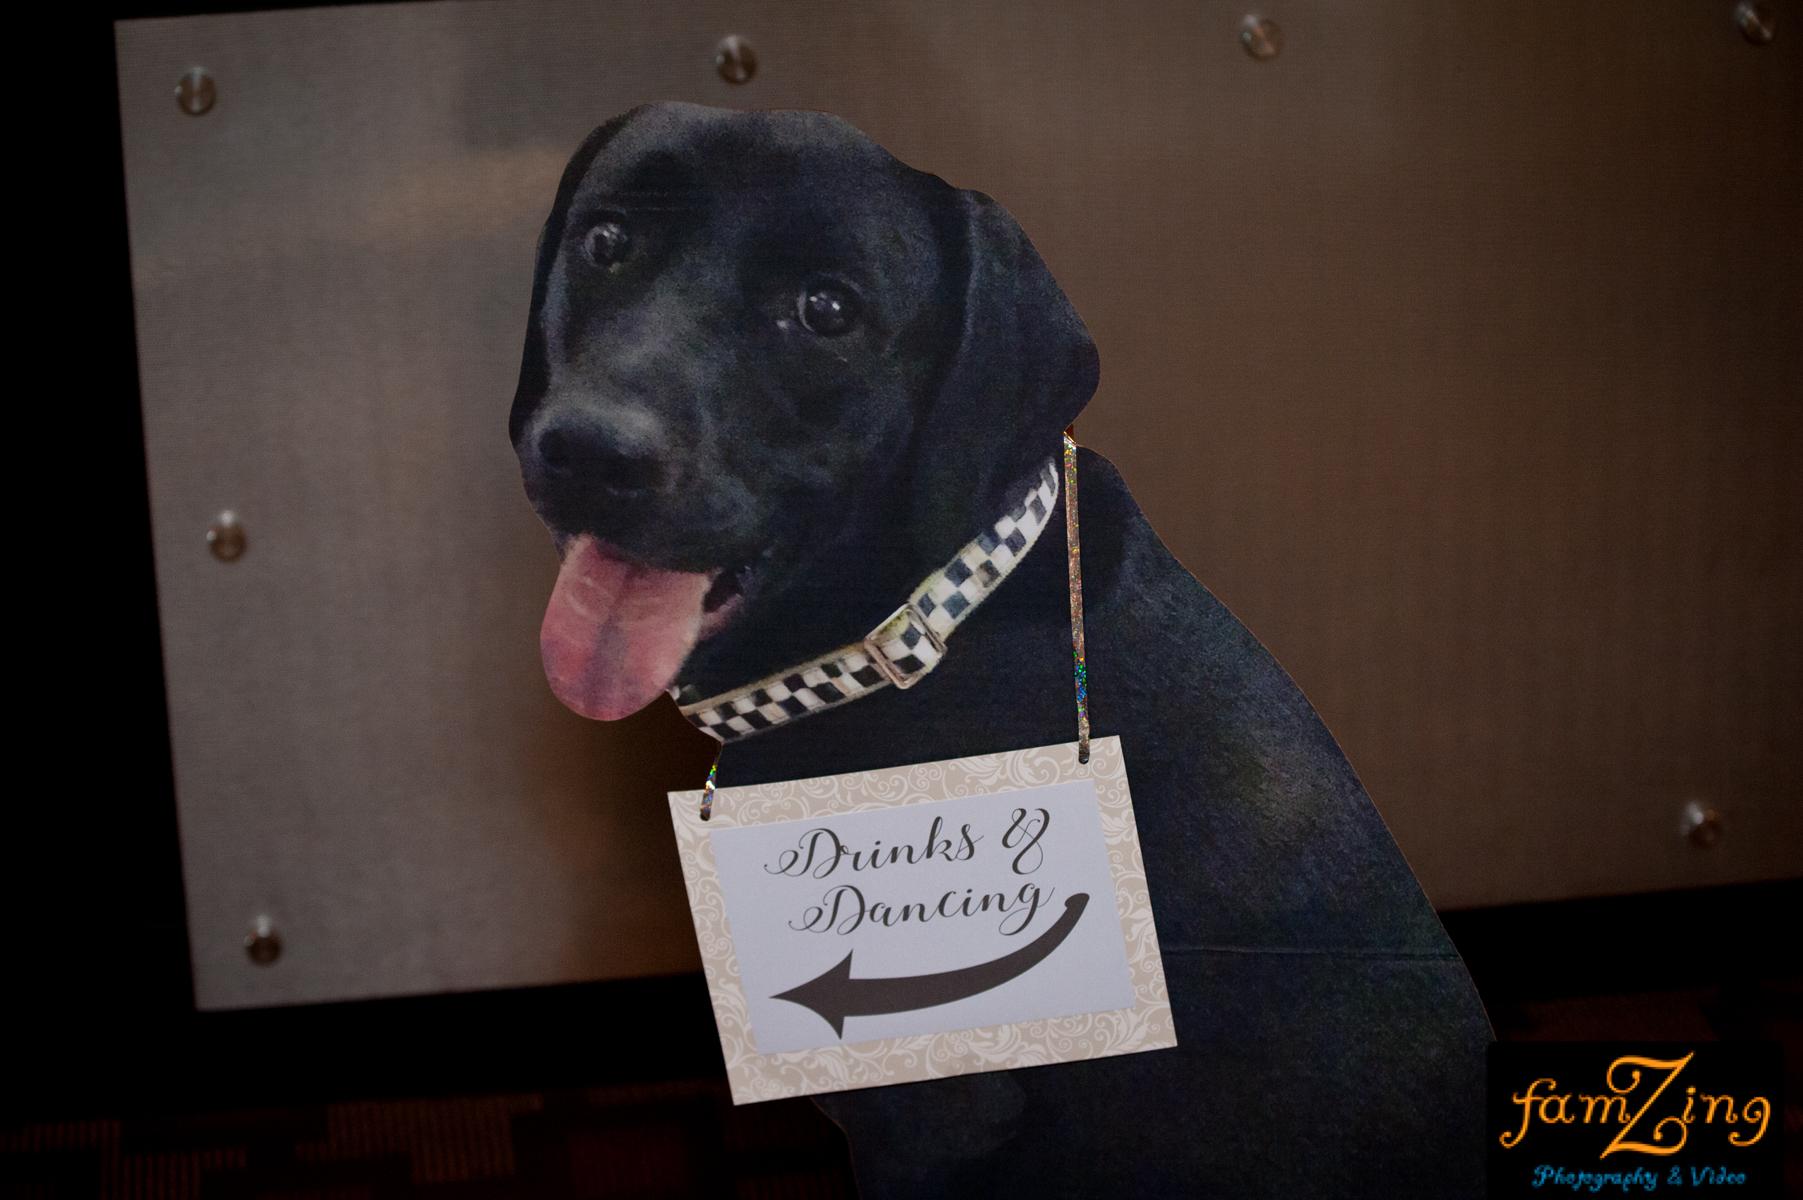 commerce club downtown greenville sc south carolina dog cut outs famzing premiere party entertainment ceremony reception dj djs disc jockey music